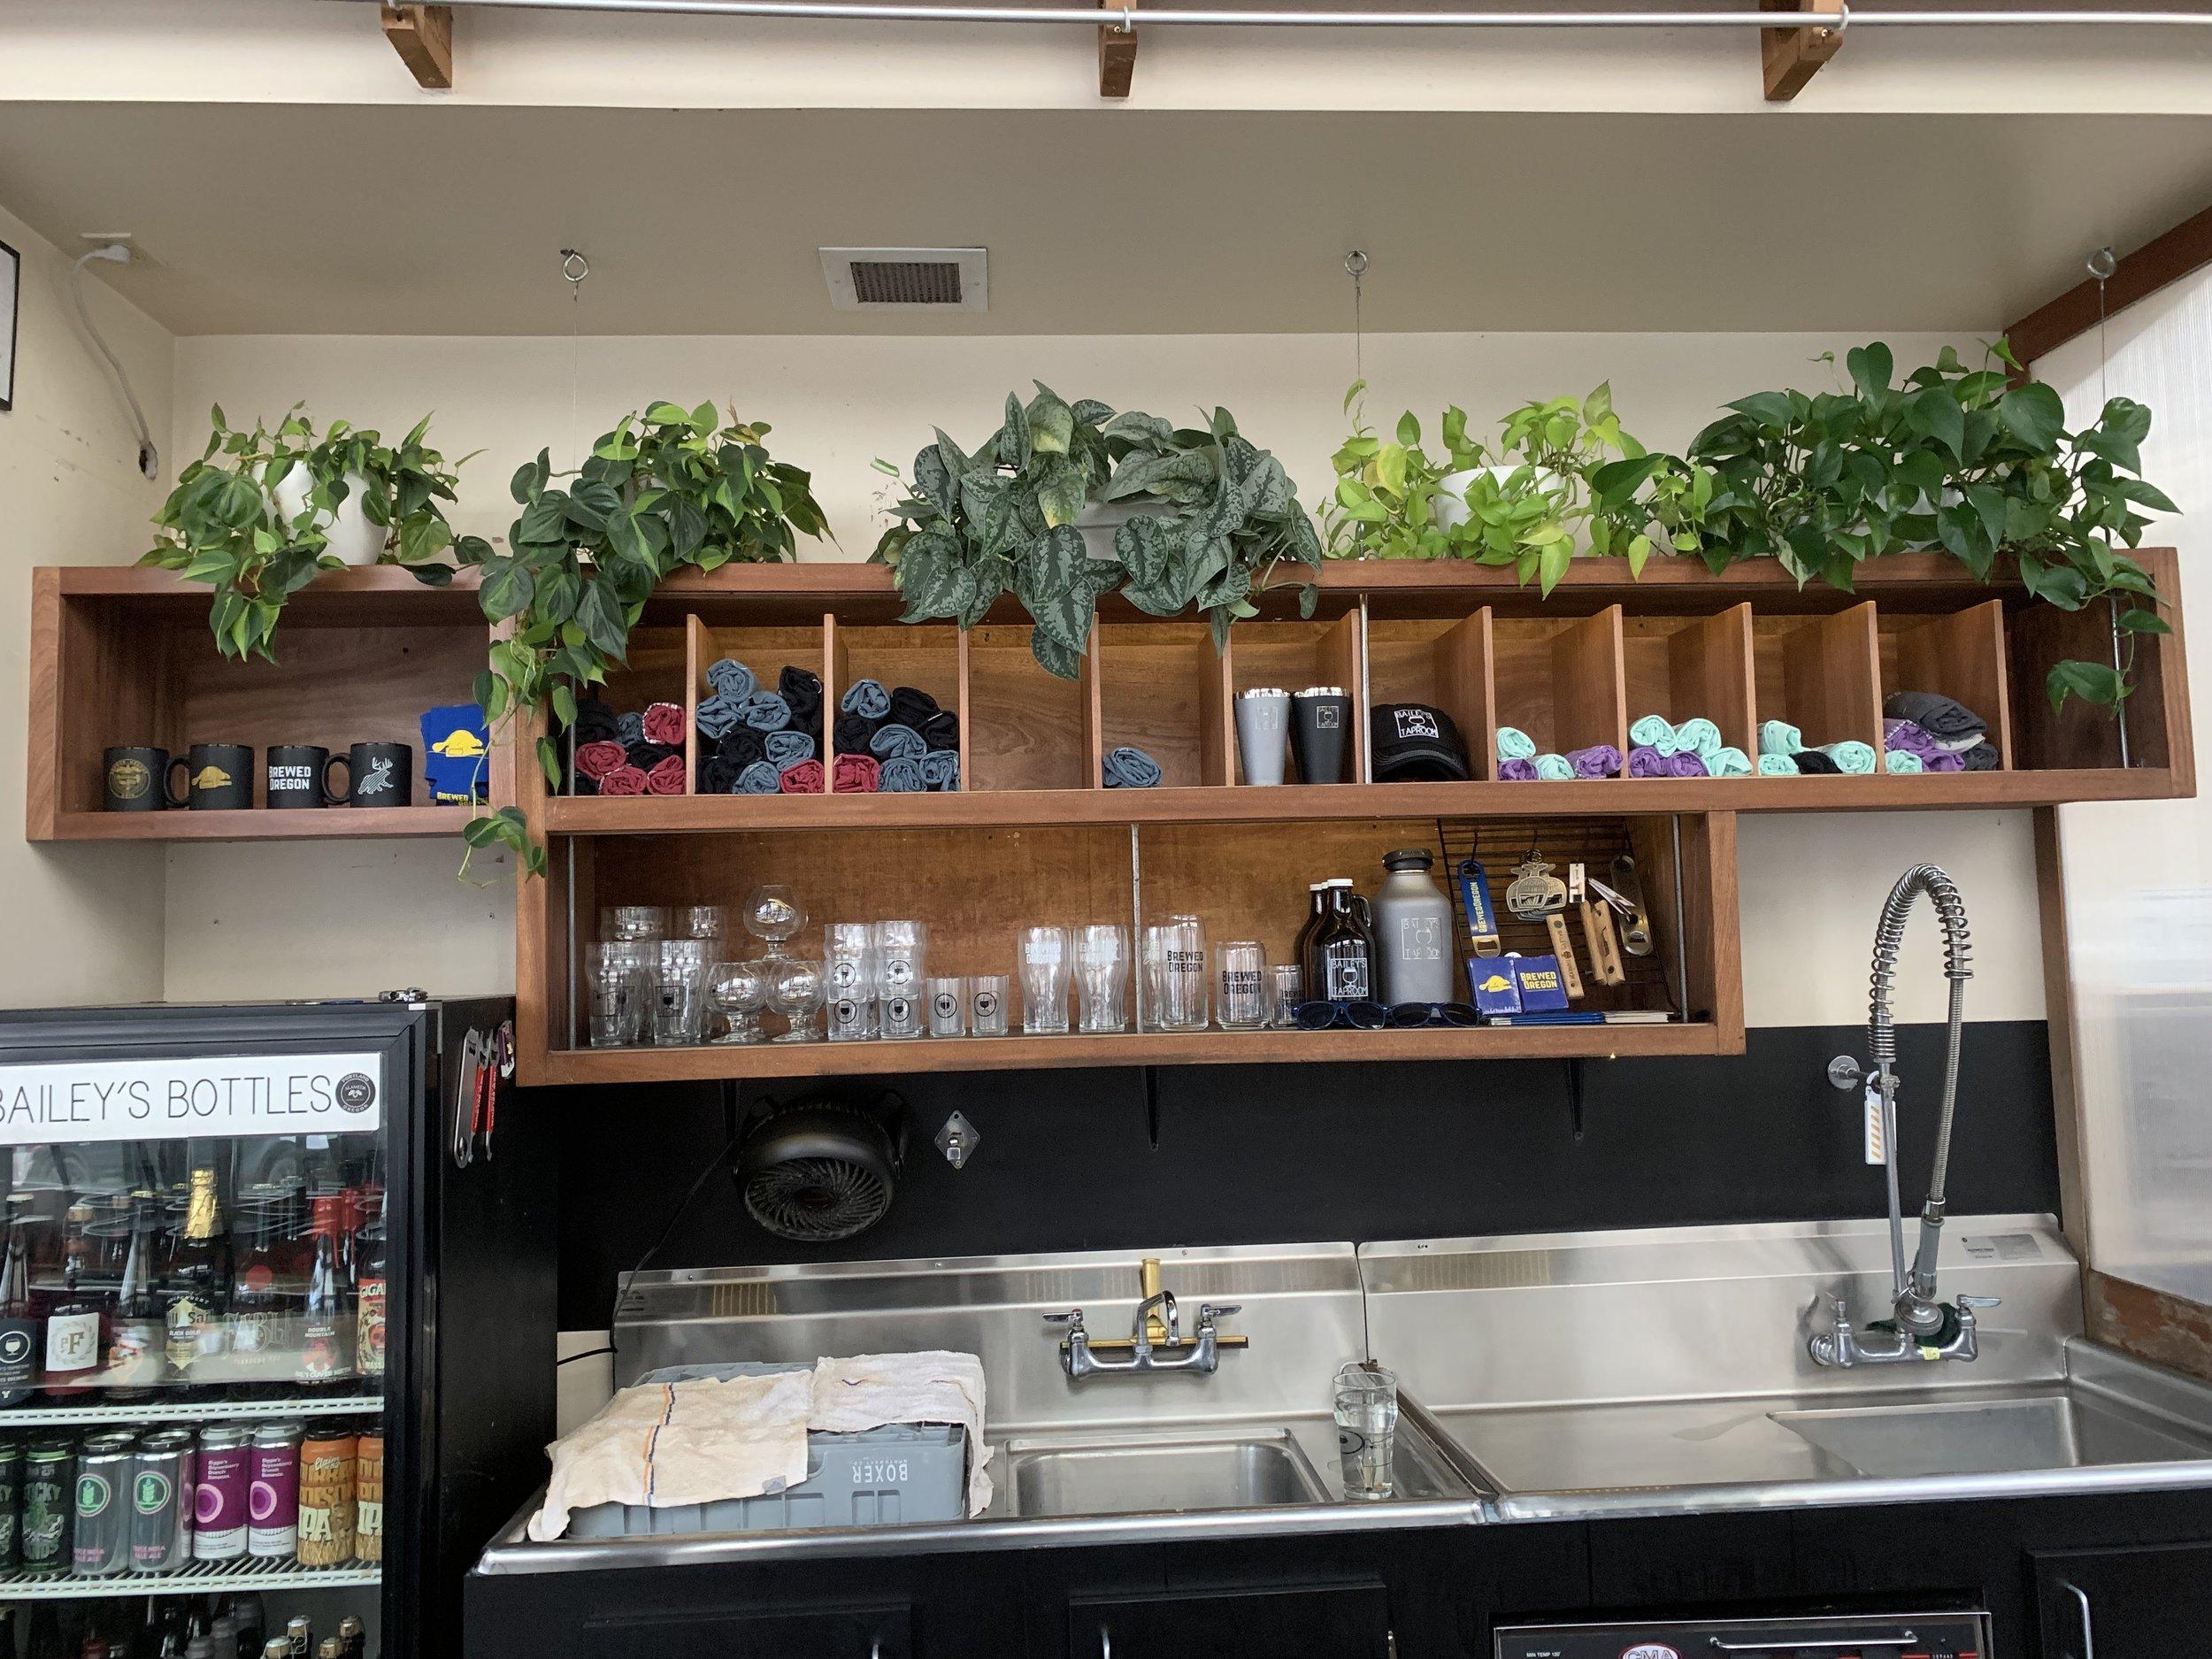 added dividers to upper shelf and cabinet on left side above fridge